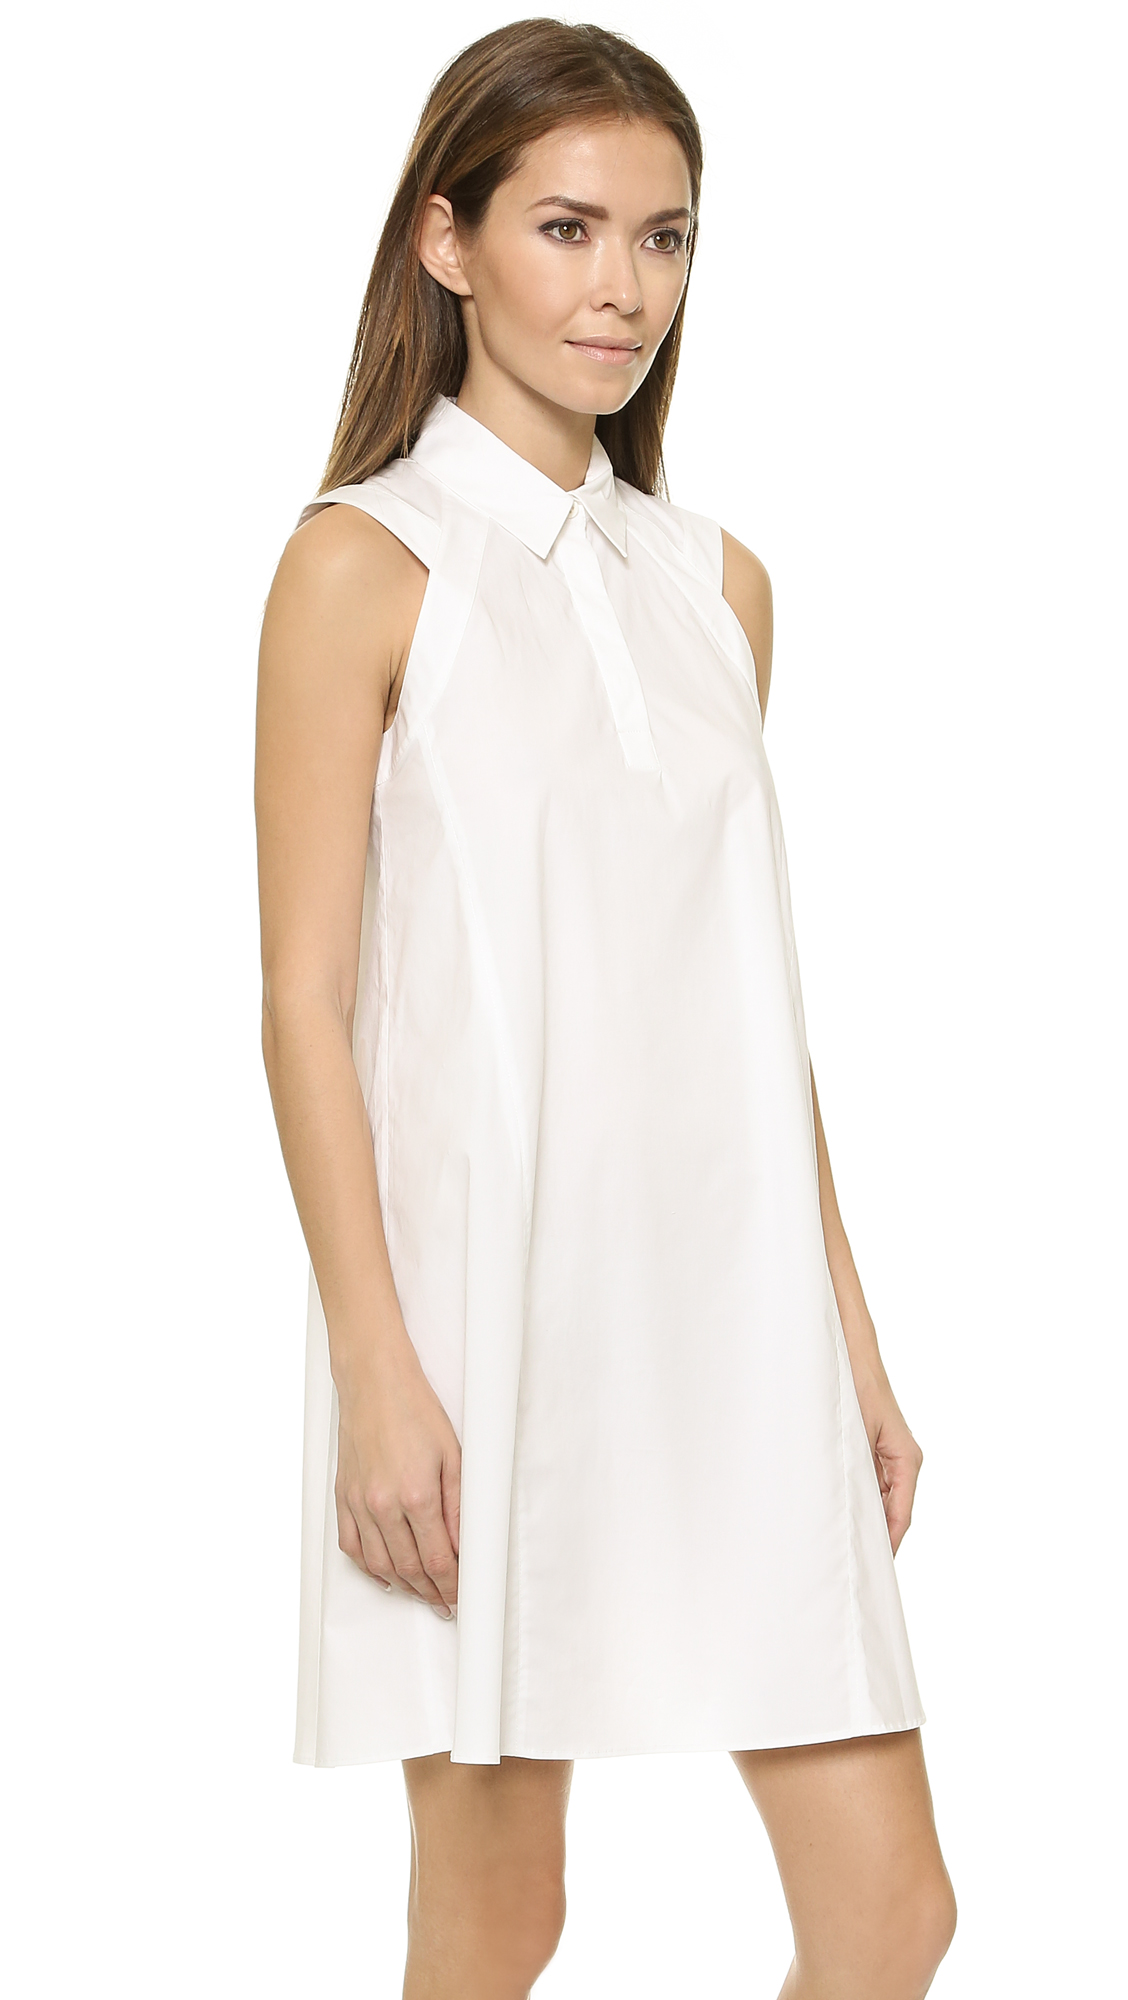 58f5d54e287655 3.1 Phillip Lim Sleeveless Trapeze Dress